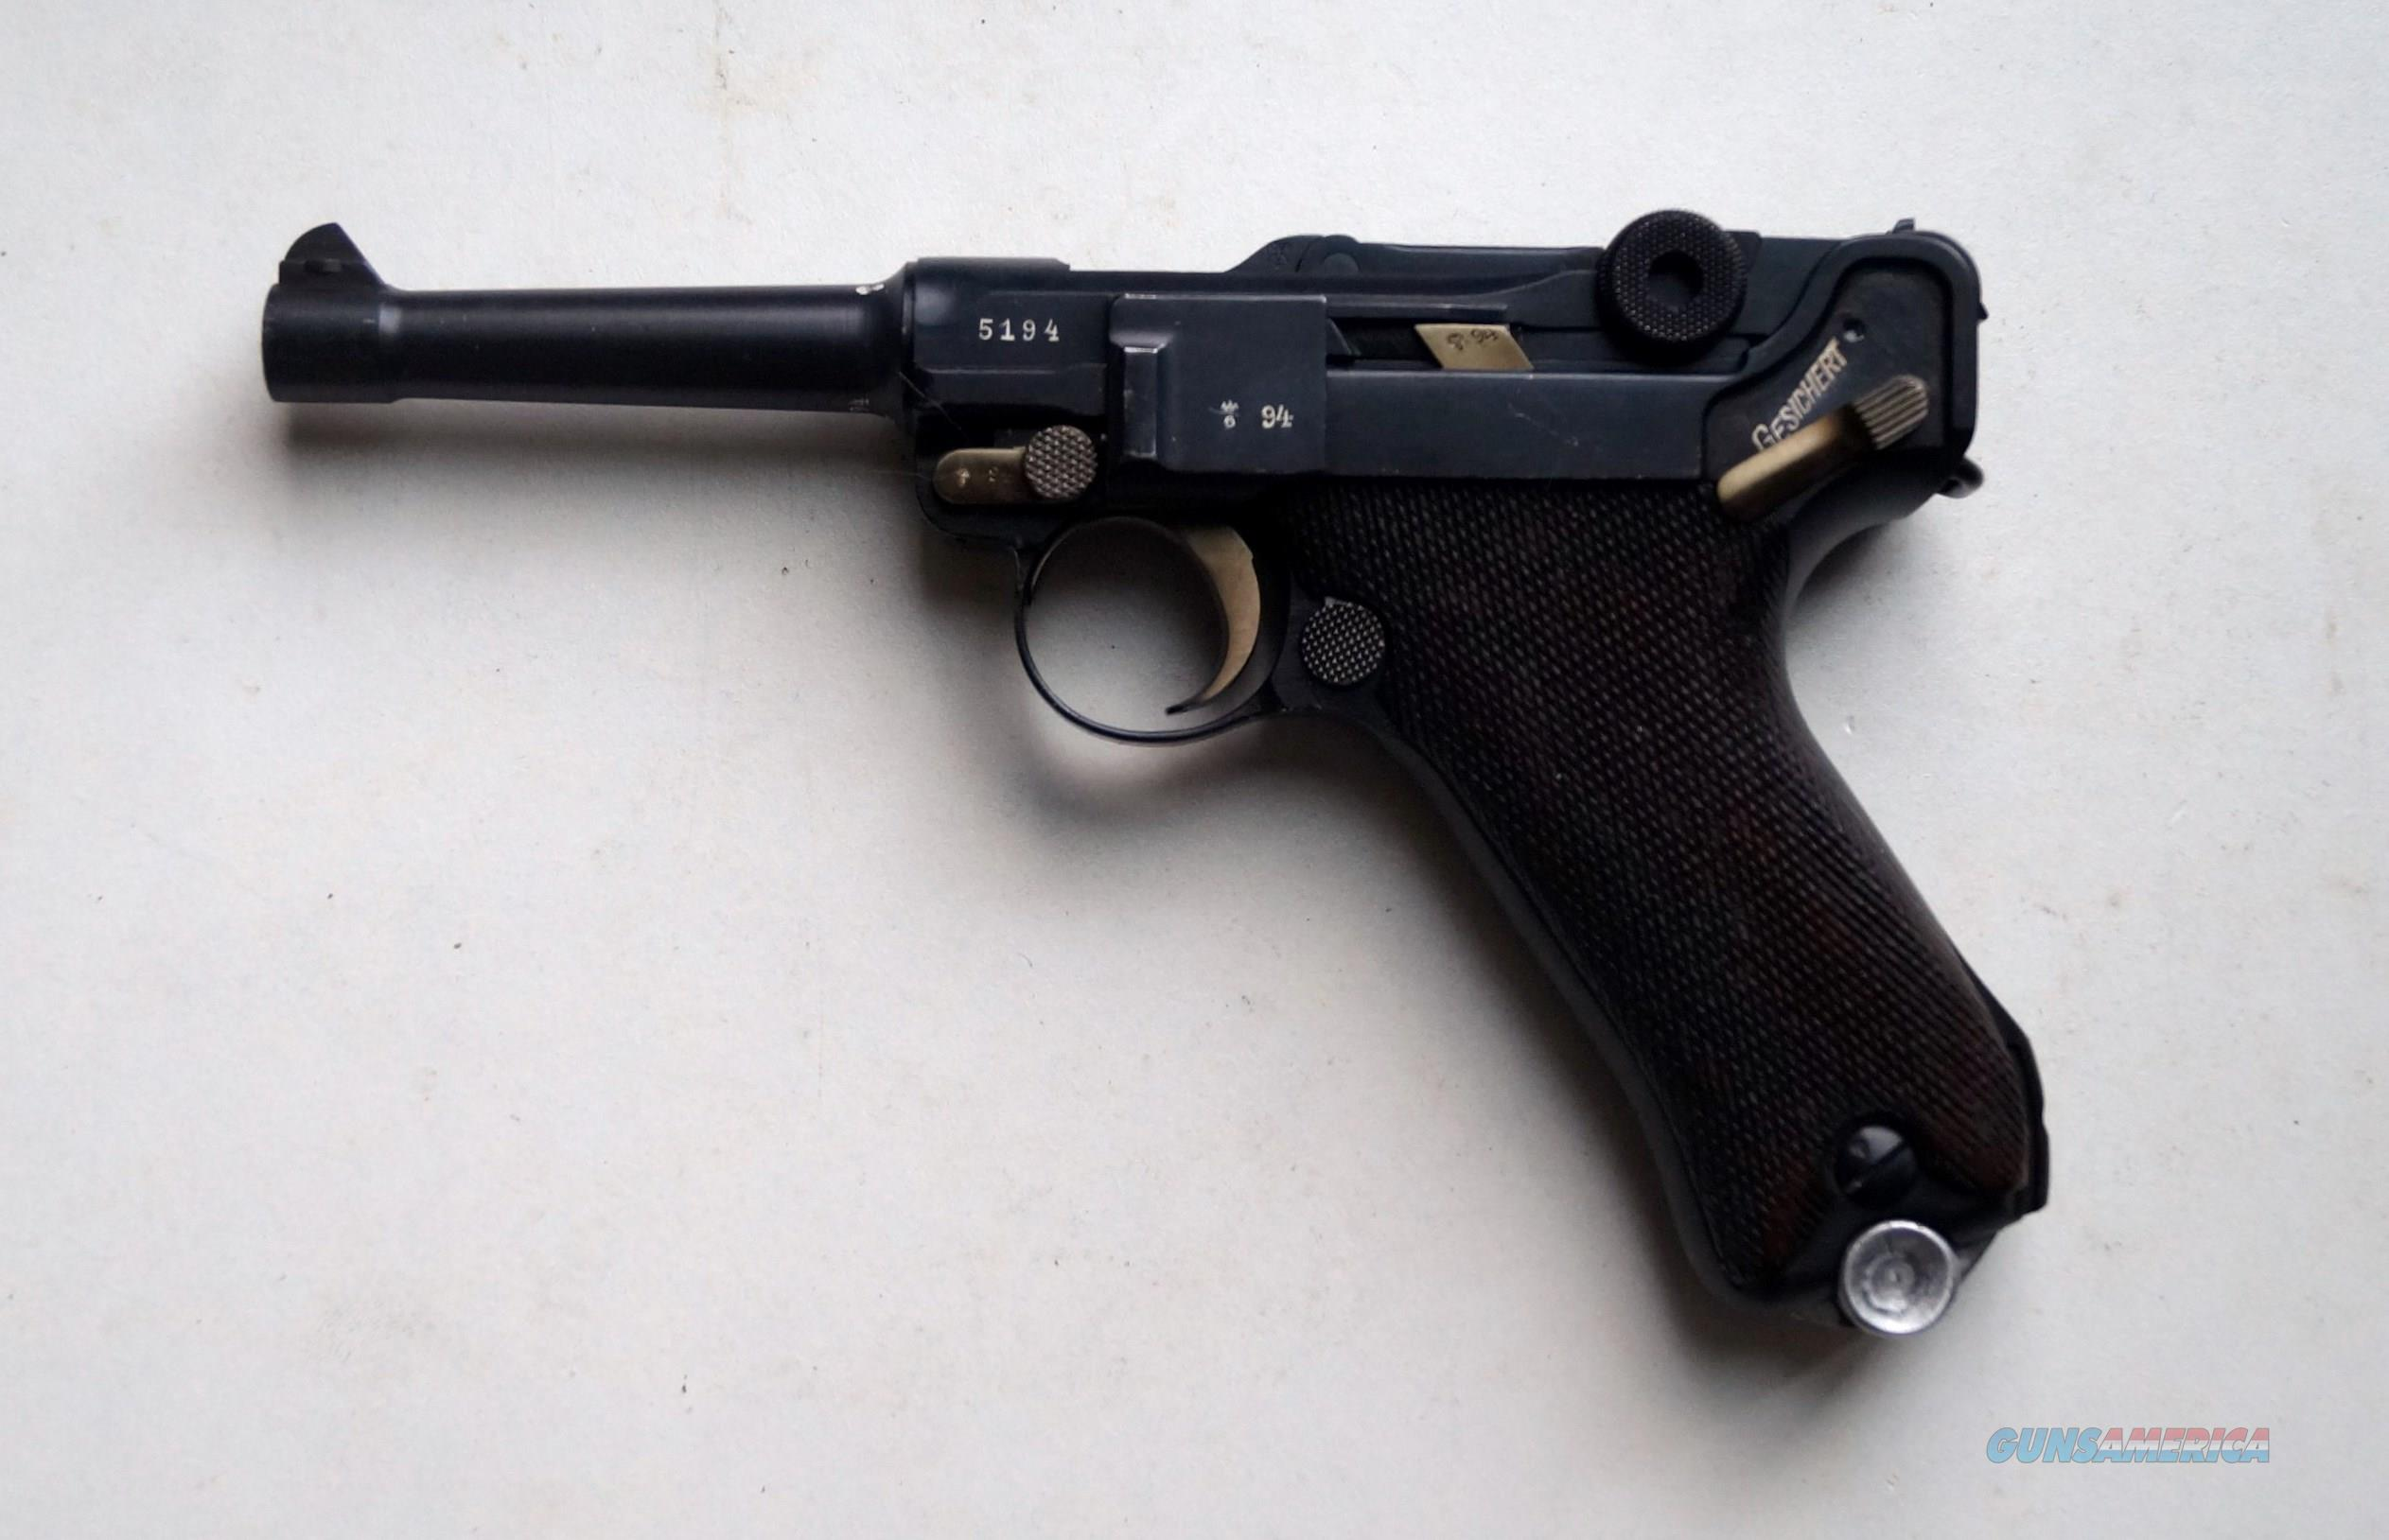 SIMSON / SUHL GERMAN LUGER WITH MATCHING # MAGAZINE  Guns > Pistols > Luger Pistols